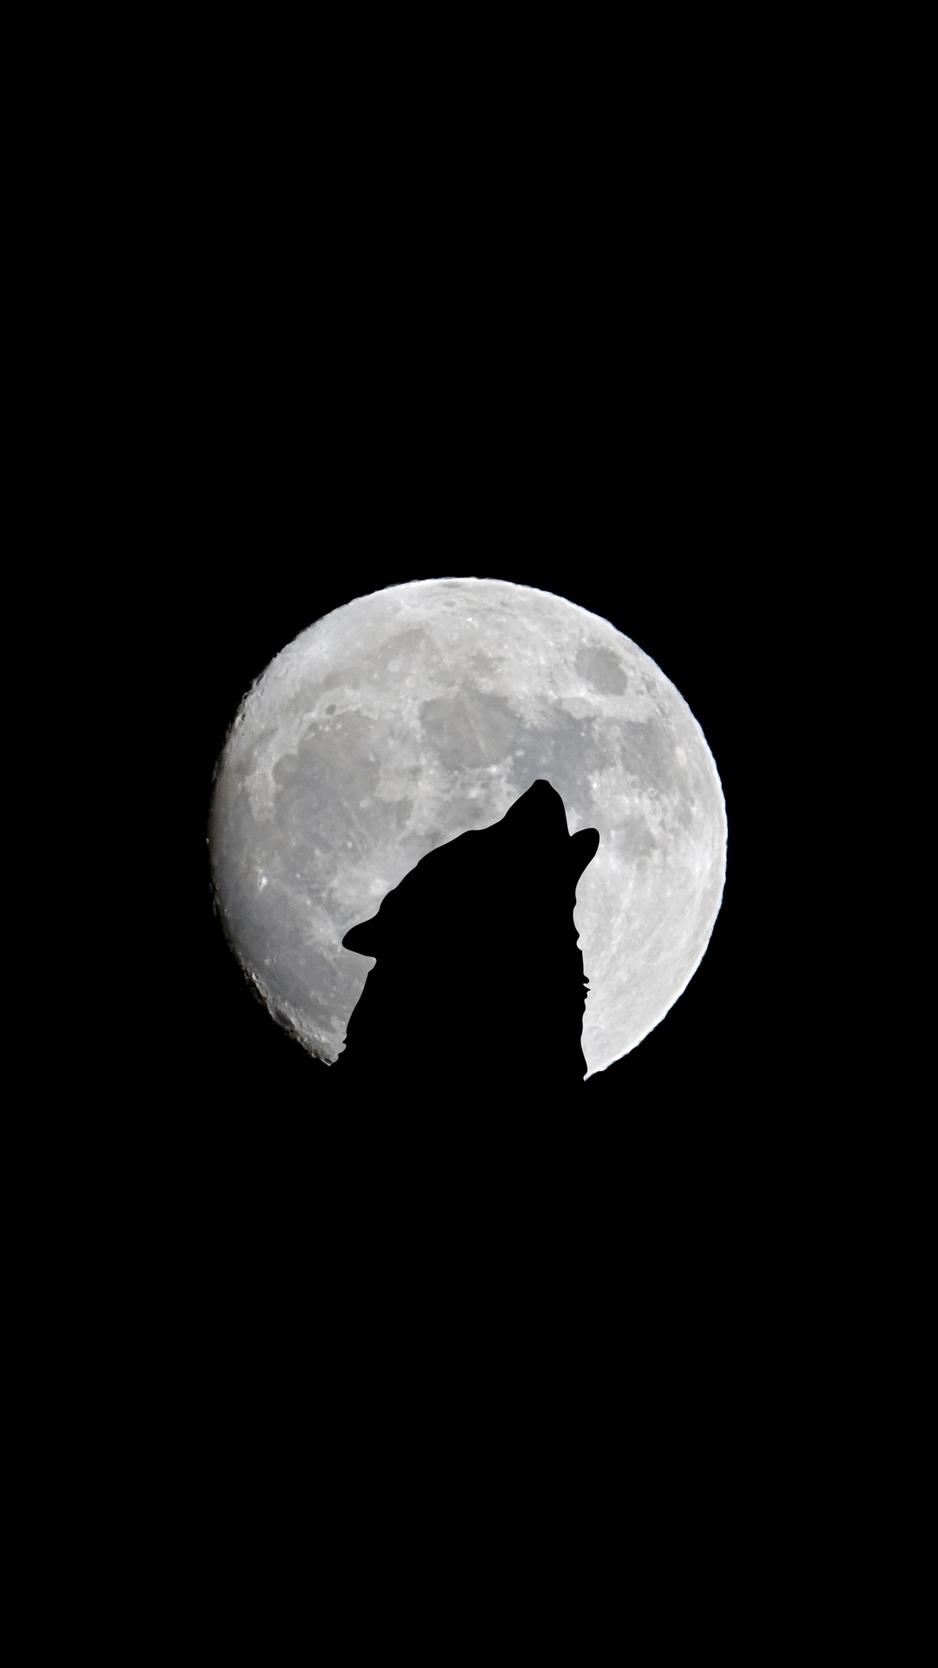 Wallpaper Full Moon Wolf Howl Bw Black Wolf With Galaxy Background 938x1668 Wallpaper Teahub Io